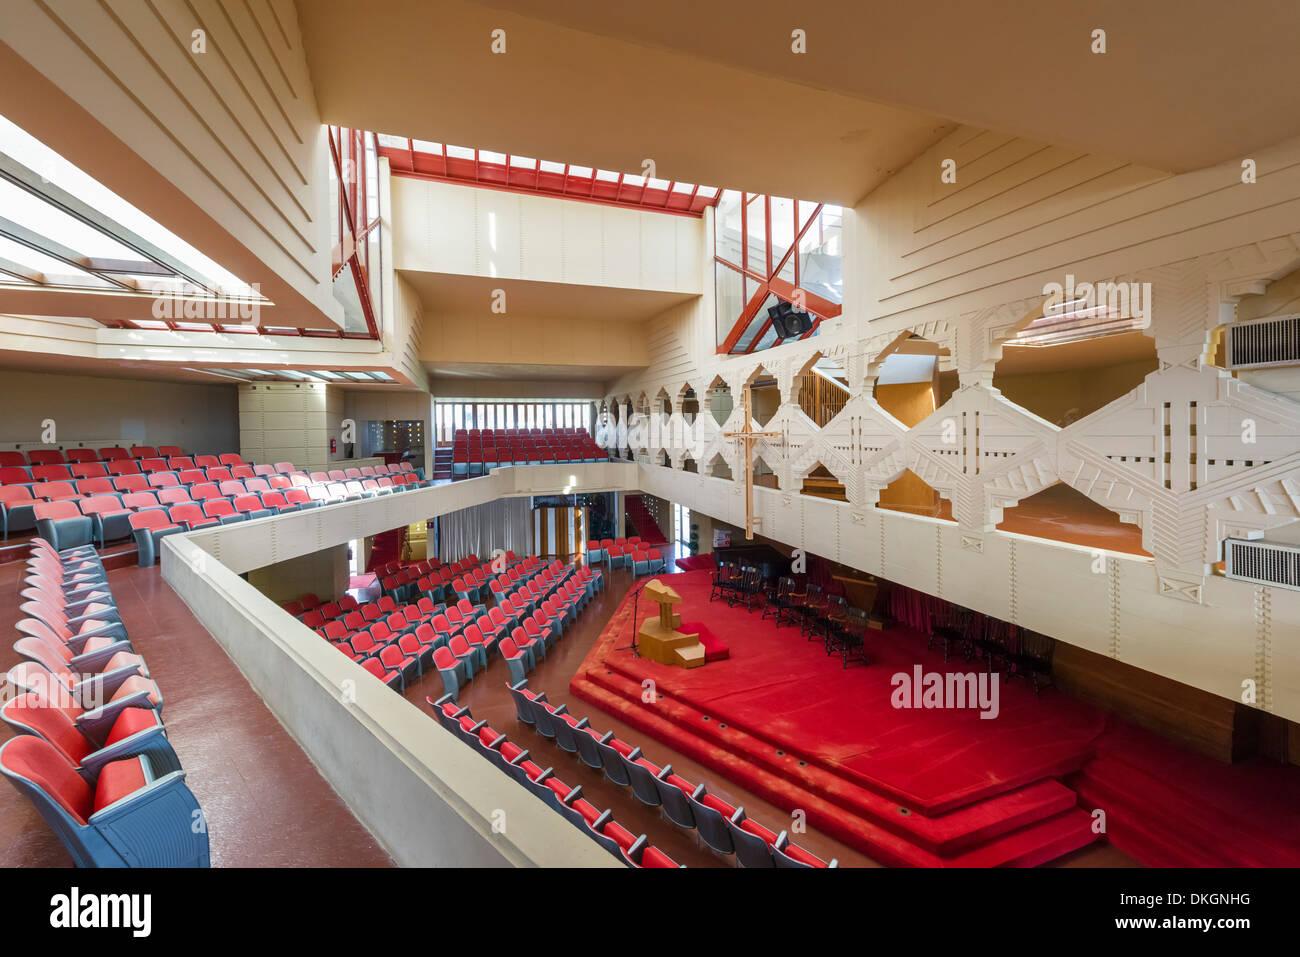 Innenraum der Kapelle Annie Pfeiffer, Frank Lloyd Wright-Campus am Florida Southern College, Lakeland, Florida, USA Stockbild